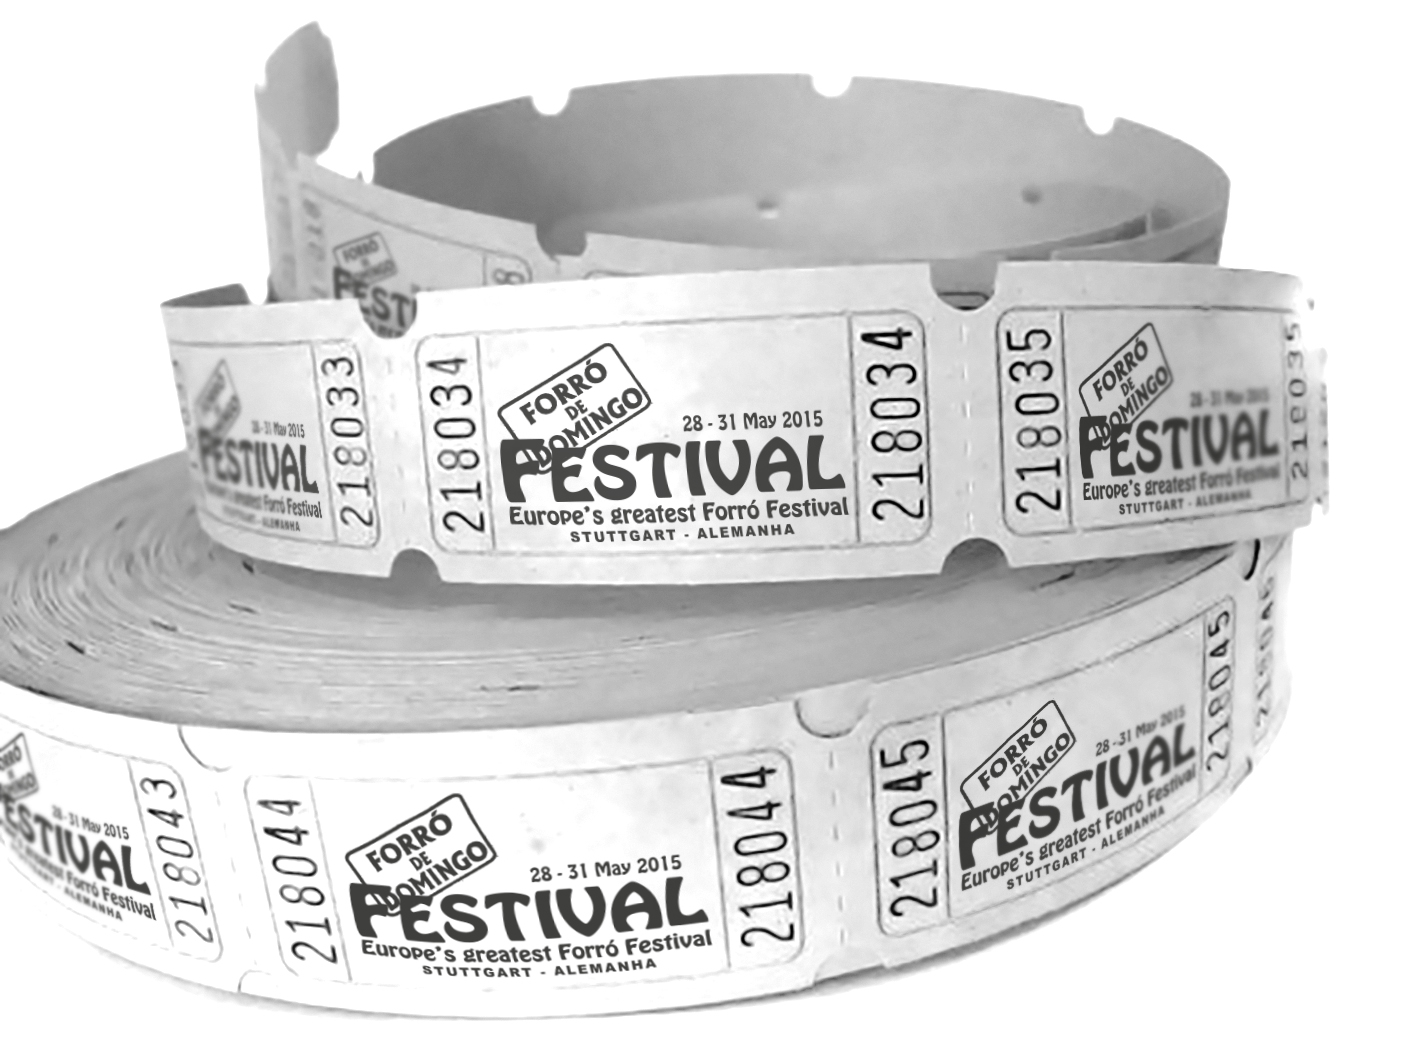 http://forrofestival.com/wp-content/uploads/2015/02/FdD-ticket_4-dias.jpg